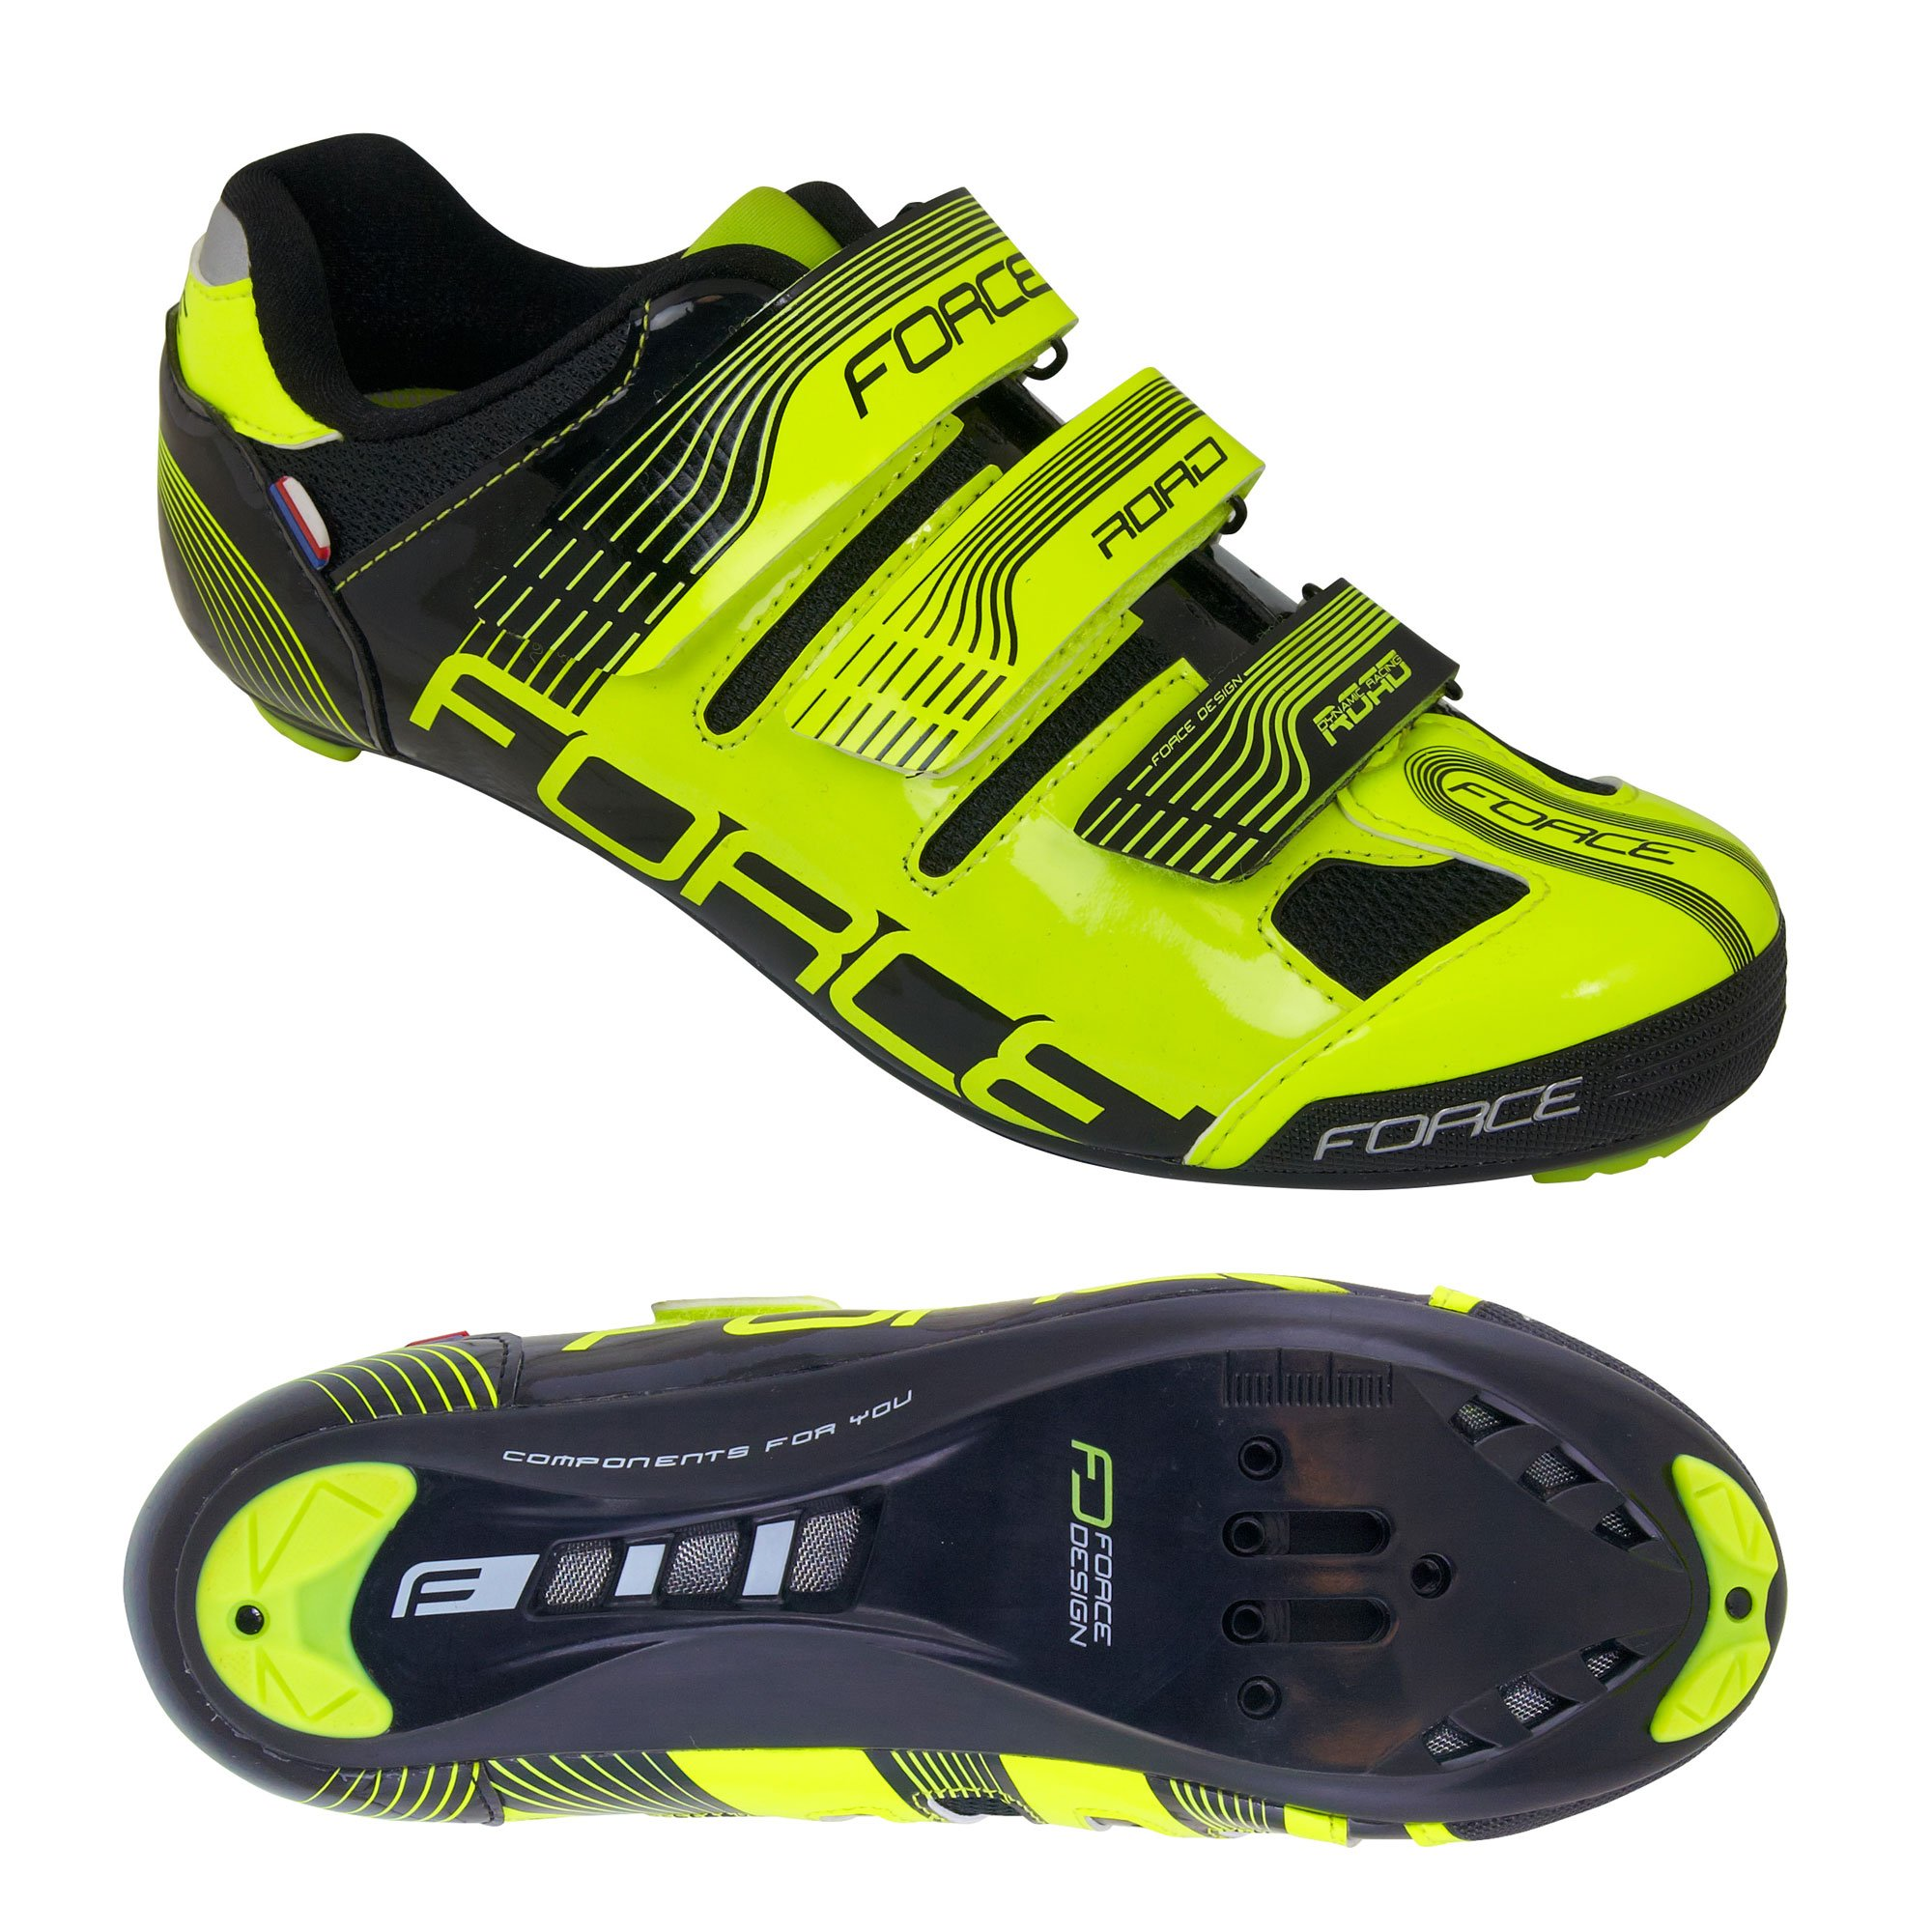 Force Road racer sko sort/fluo | Sko